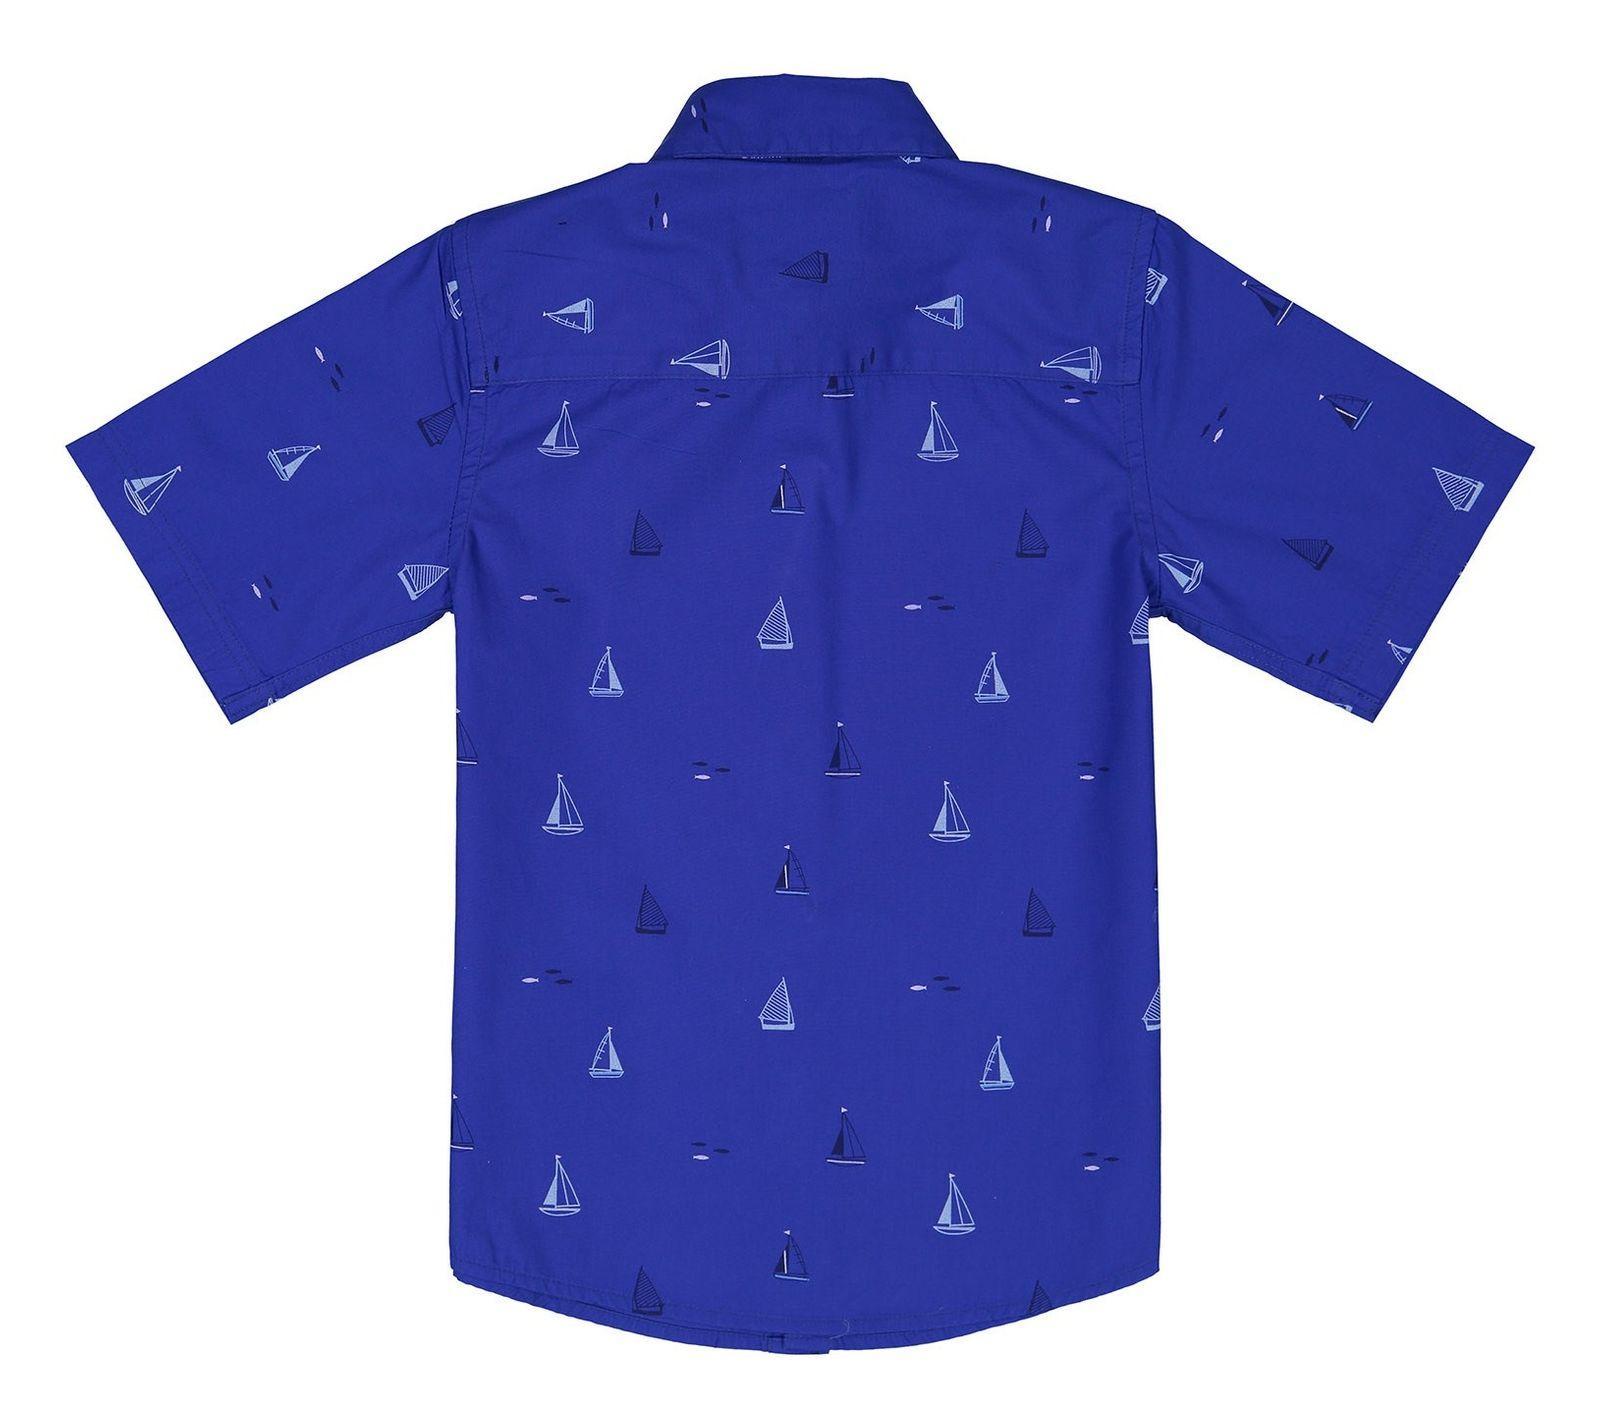 پیراهن نخی پسرانه - جی بای جسپرکنران - آبي  - 2